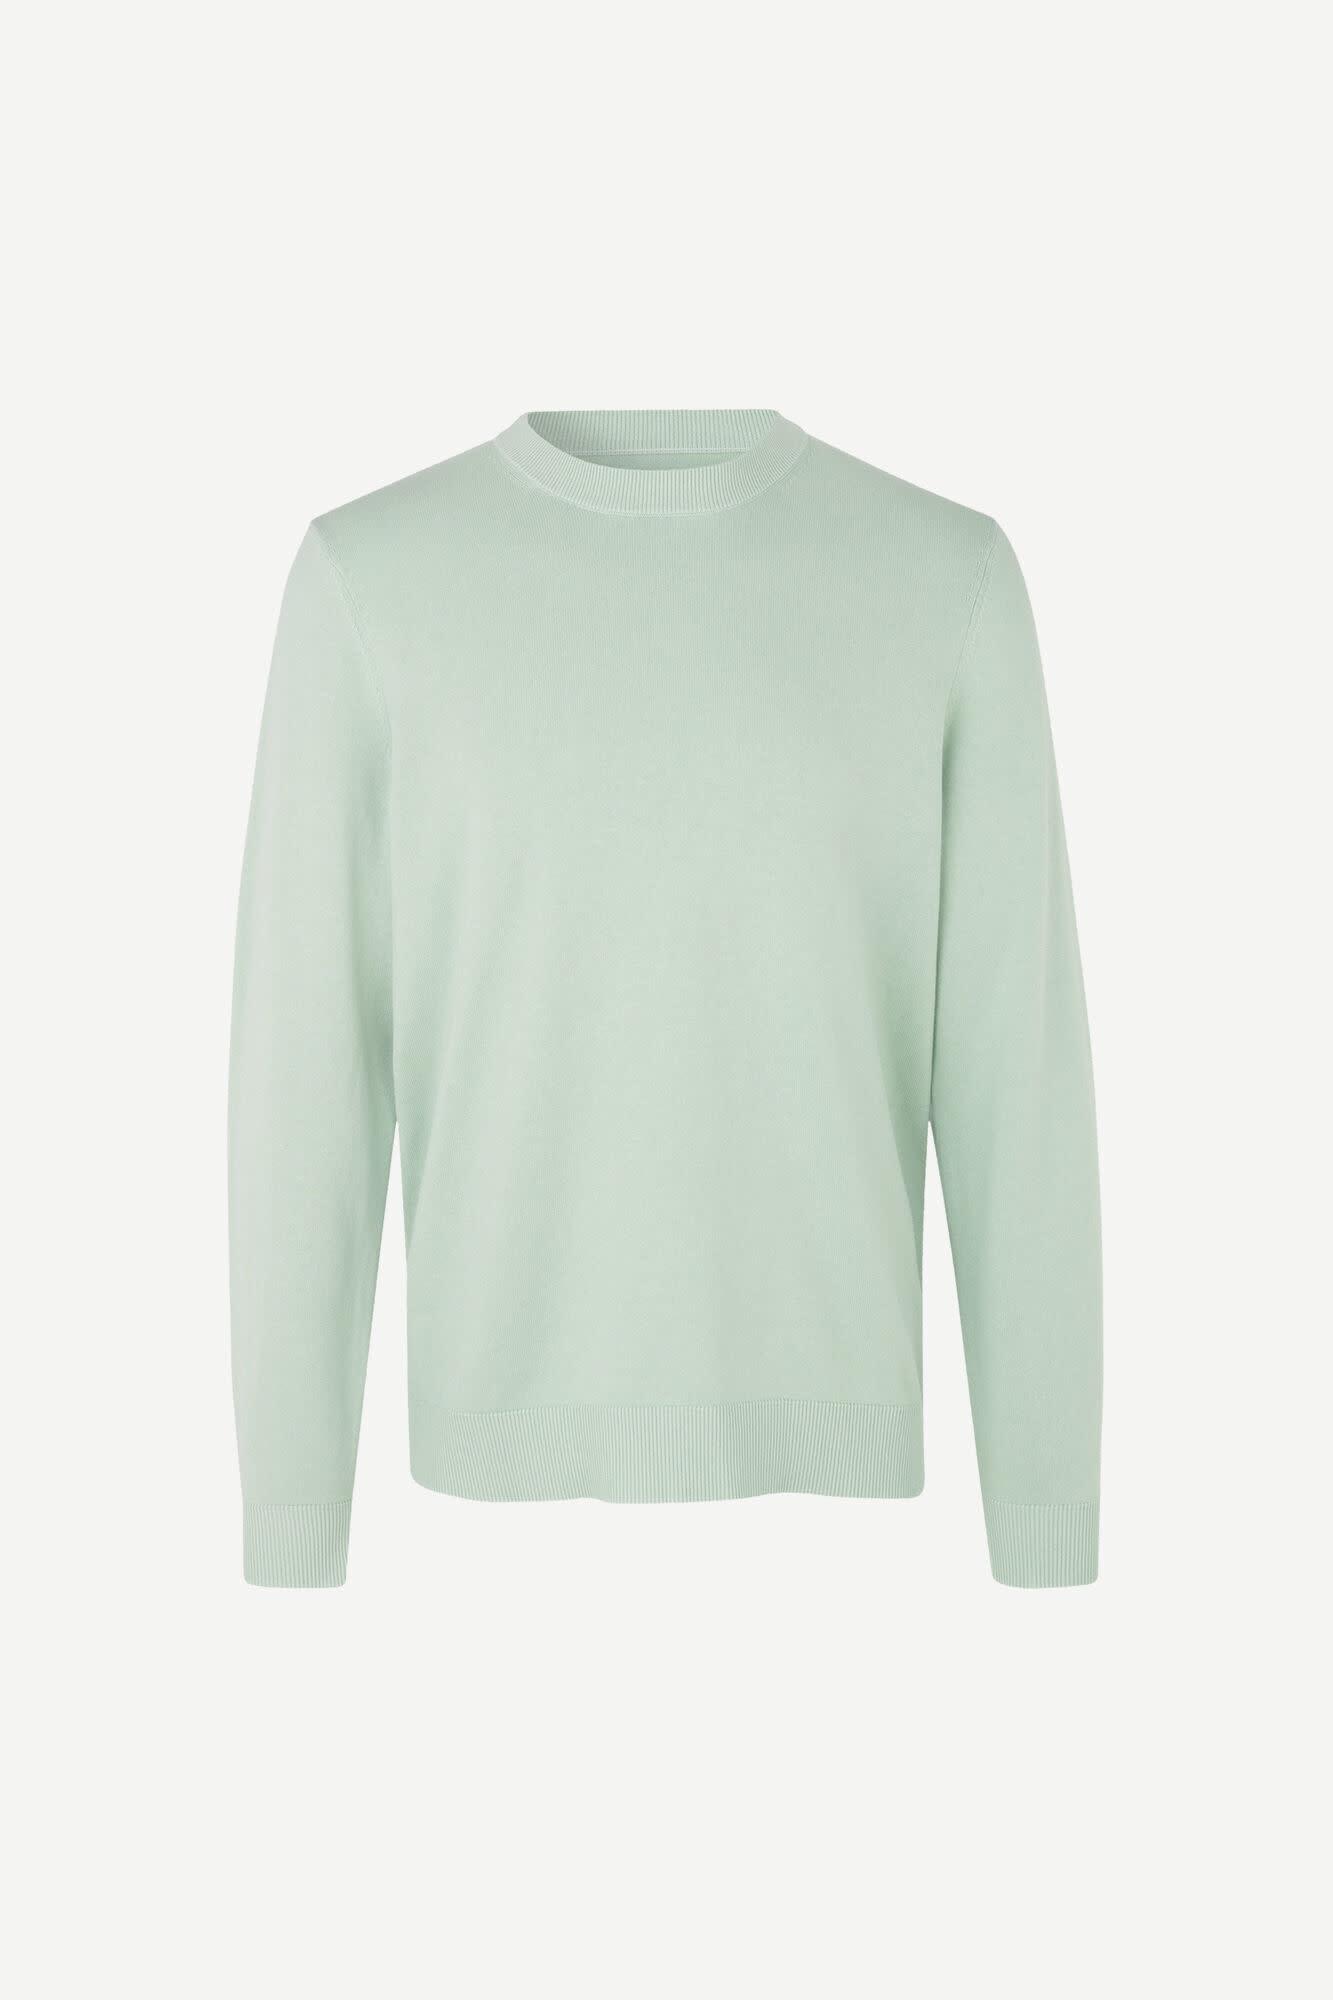 Ferris Frosty Green Crew Neck Sweatshirt-1